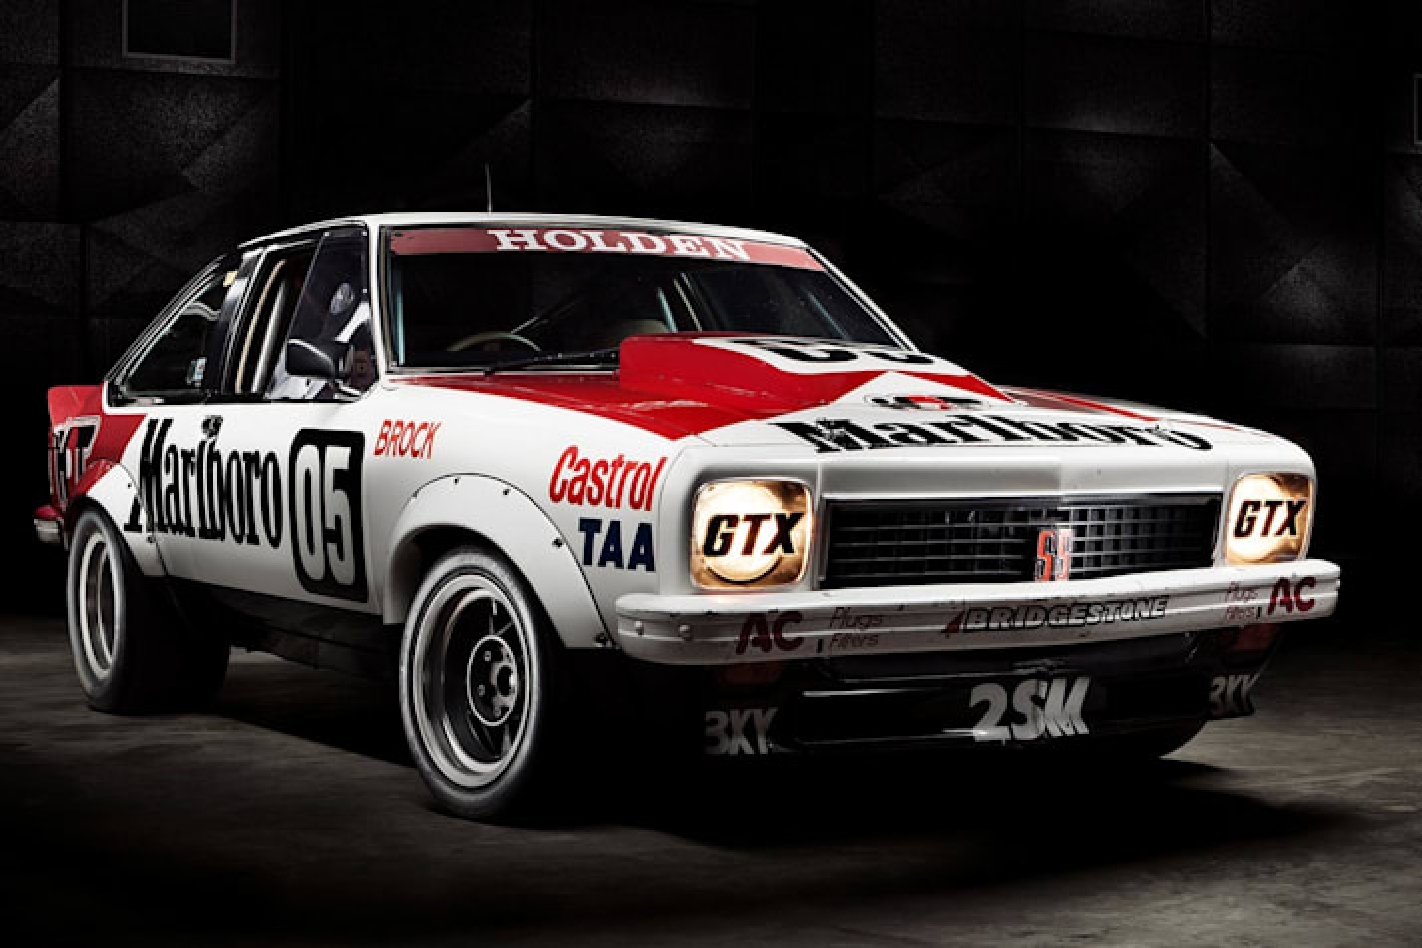 Holden Motorsport Lead Jpg